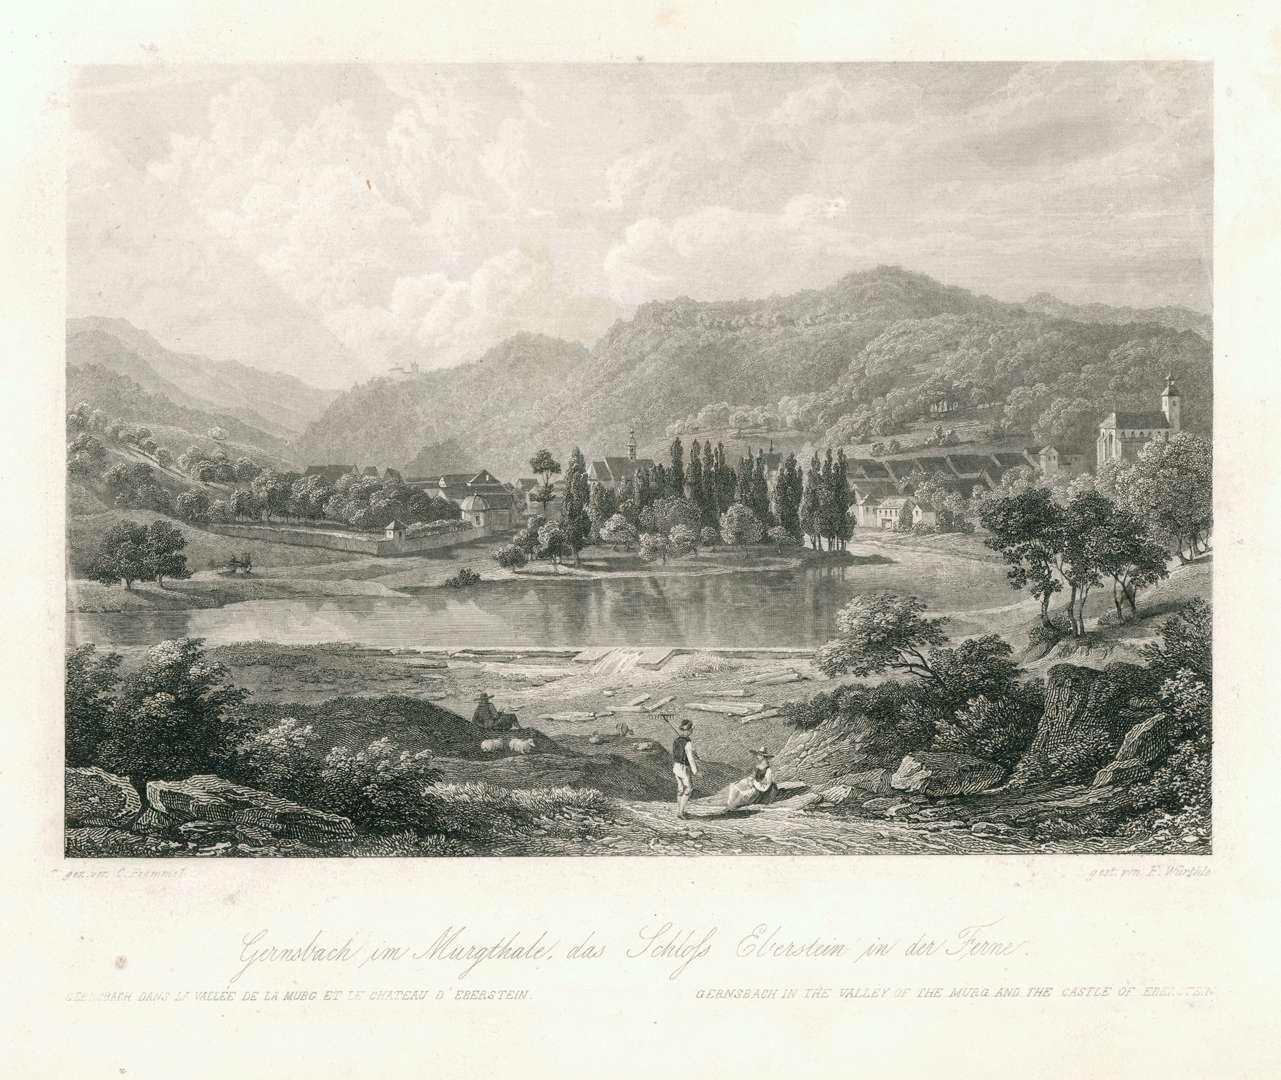 Gernsbach im Murgthale, das Schloss Eberstein in der Ferne. Gernsbach dans la Vallée de la Murg et le Chateau d